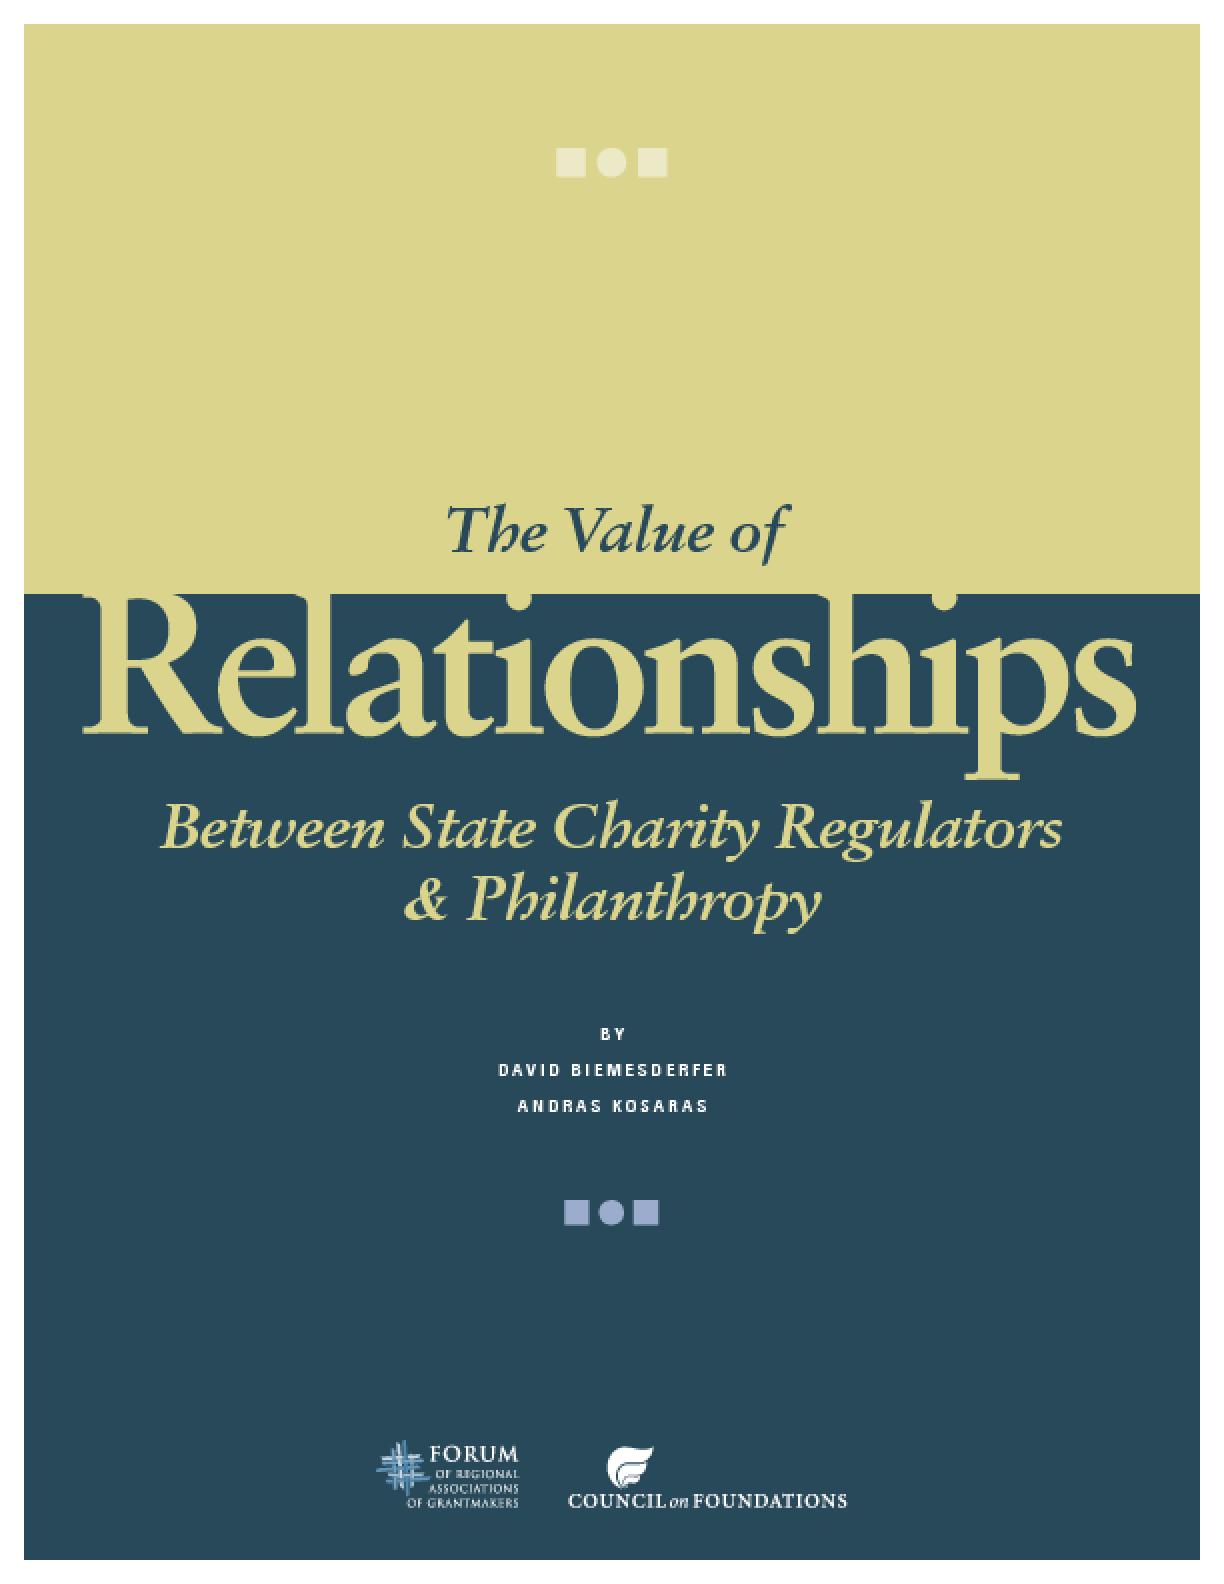 Value of Relationships Between State Charity Regulators & Philanthropy